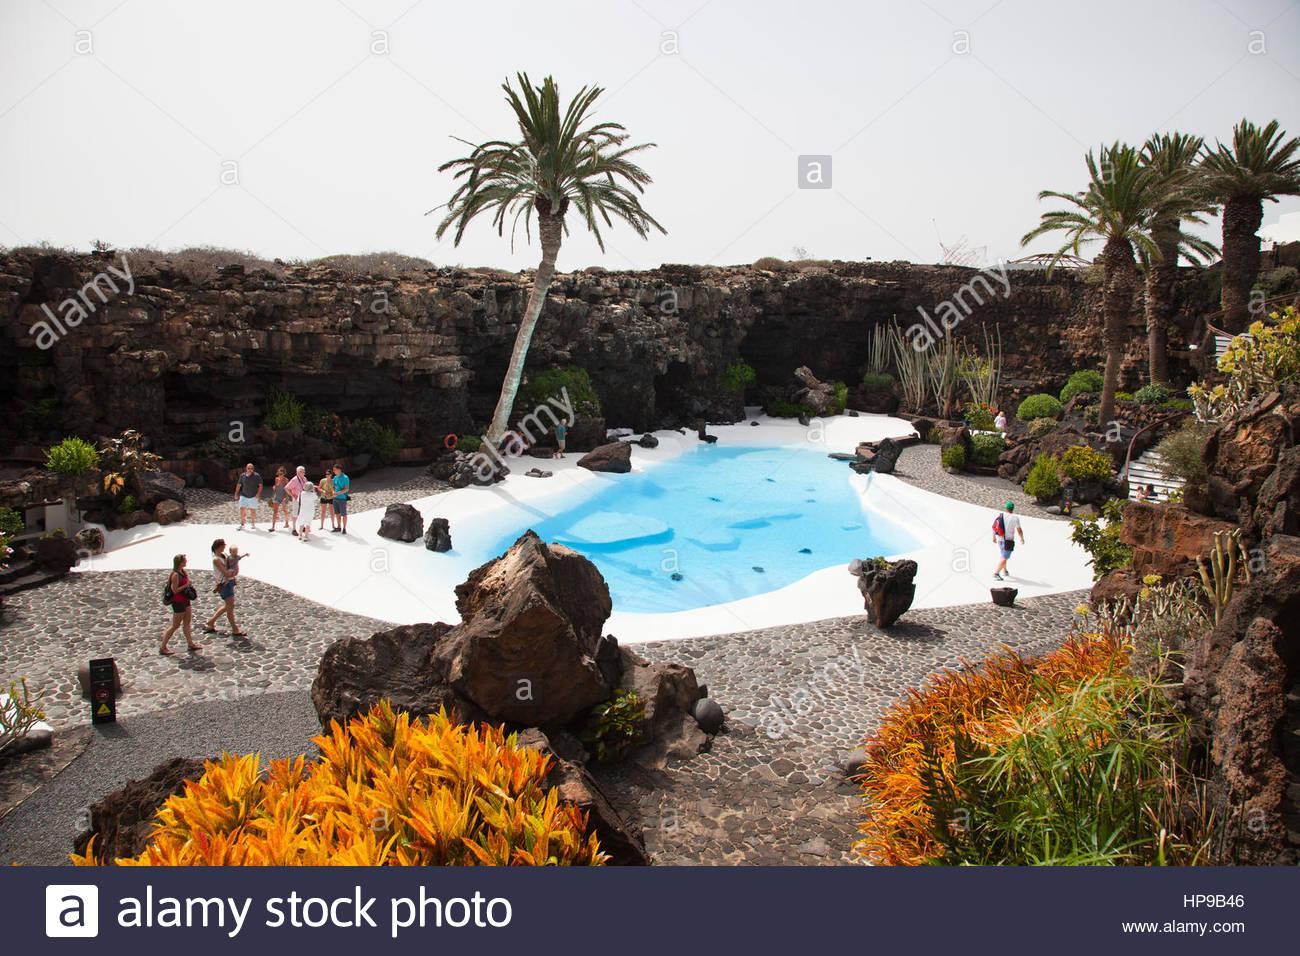 Jameo del Agua by artist Cesar Manrique,Malpais de la Corona area,Lanzarote,Canary,Spain - Stock Image